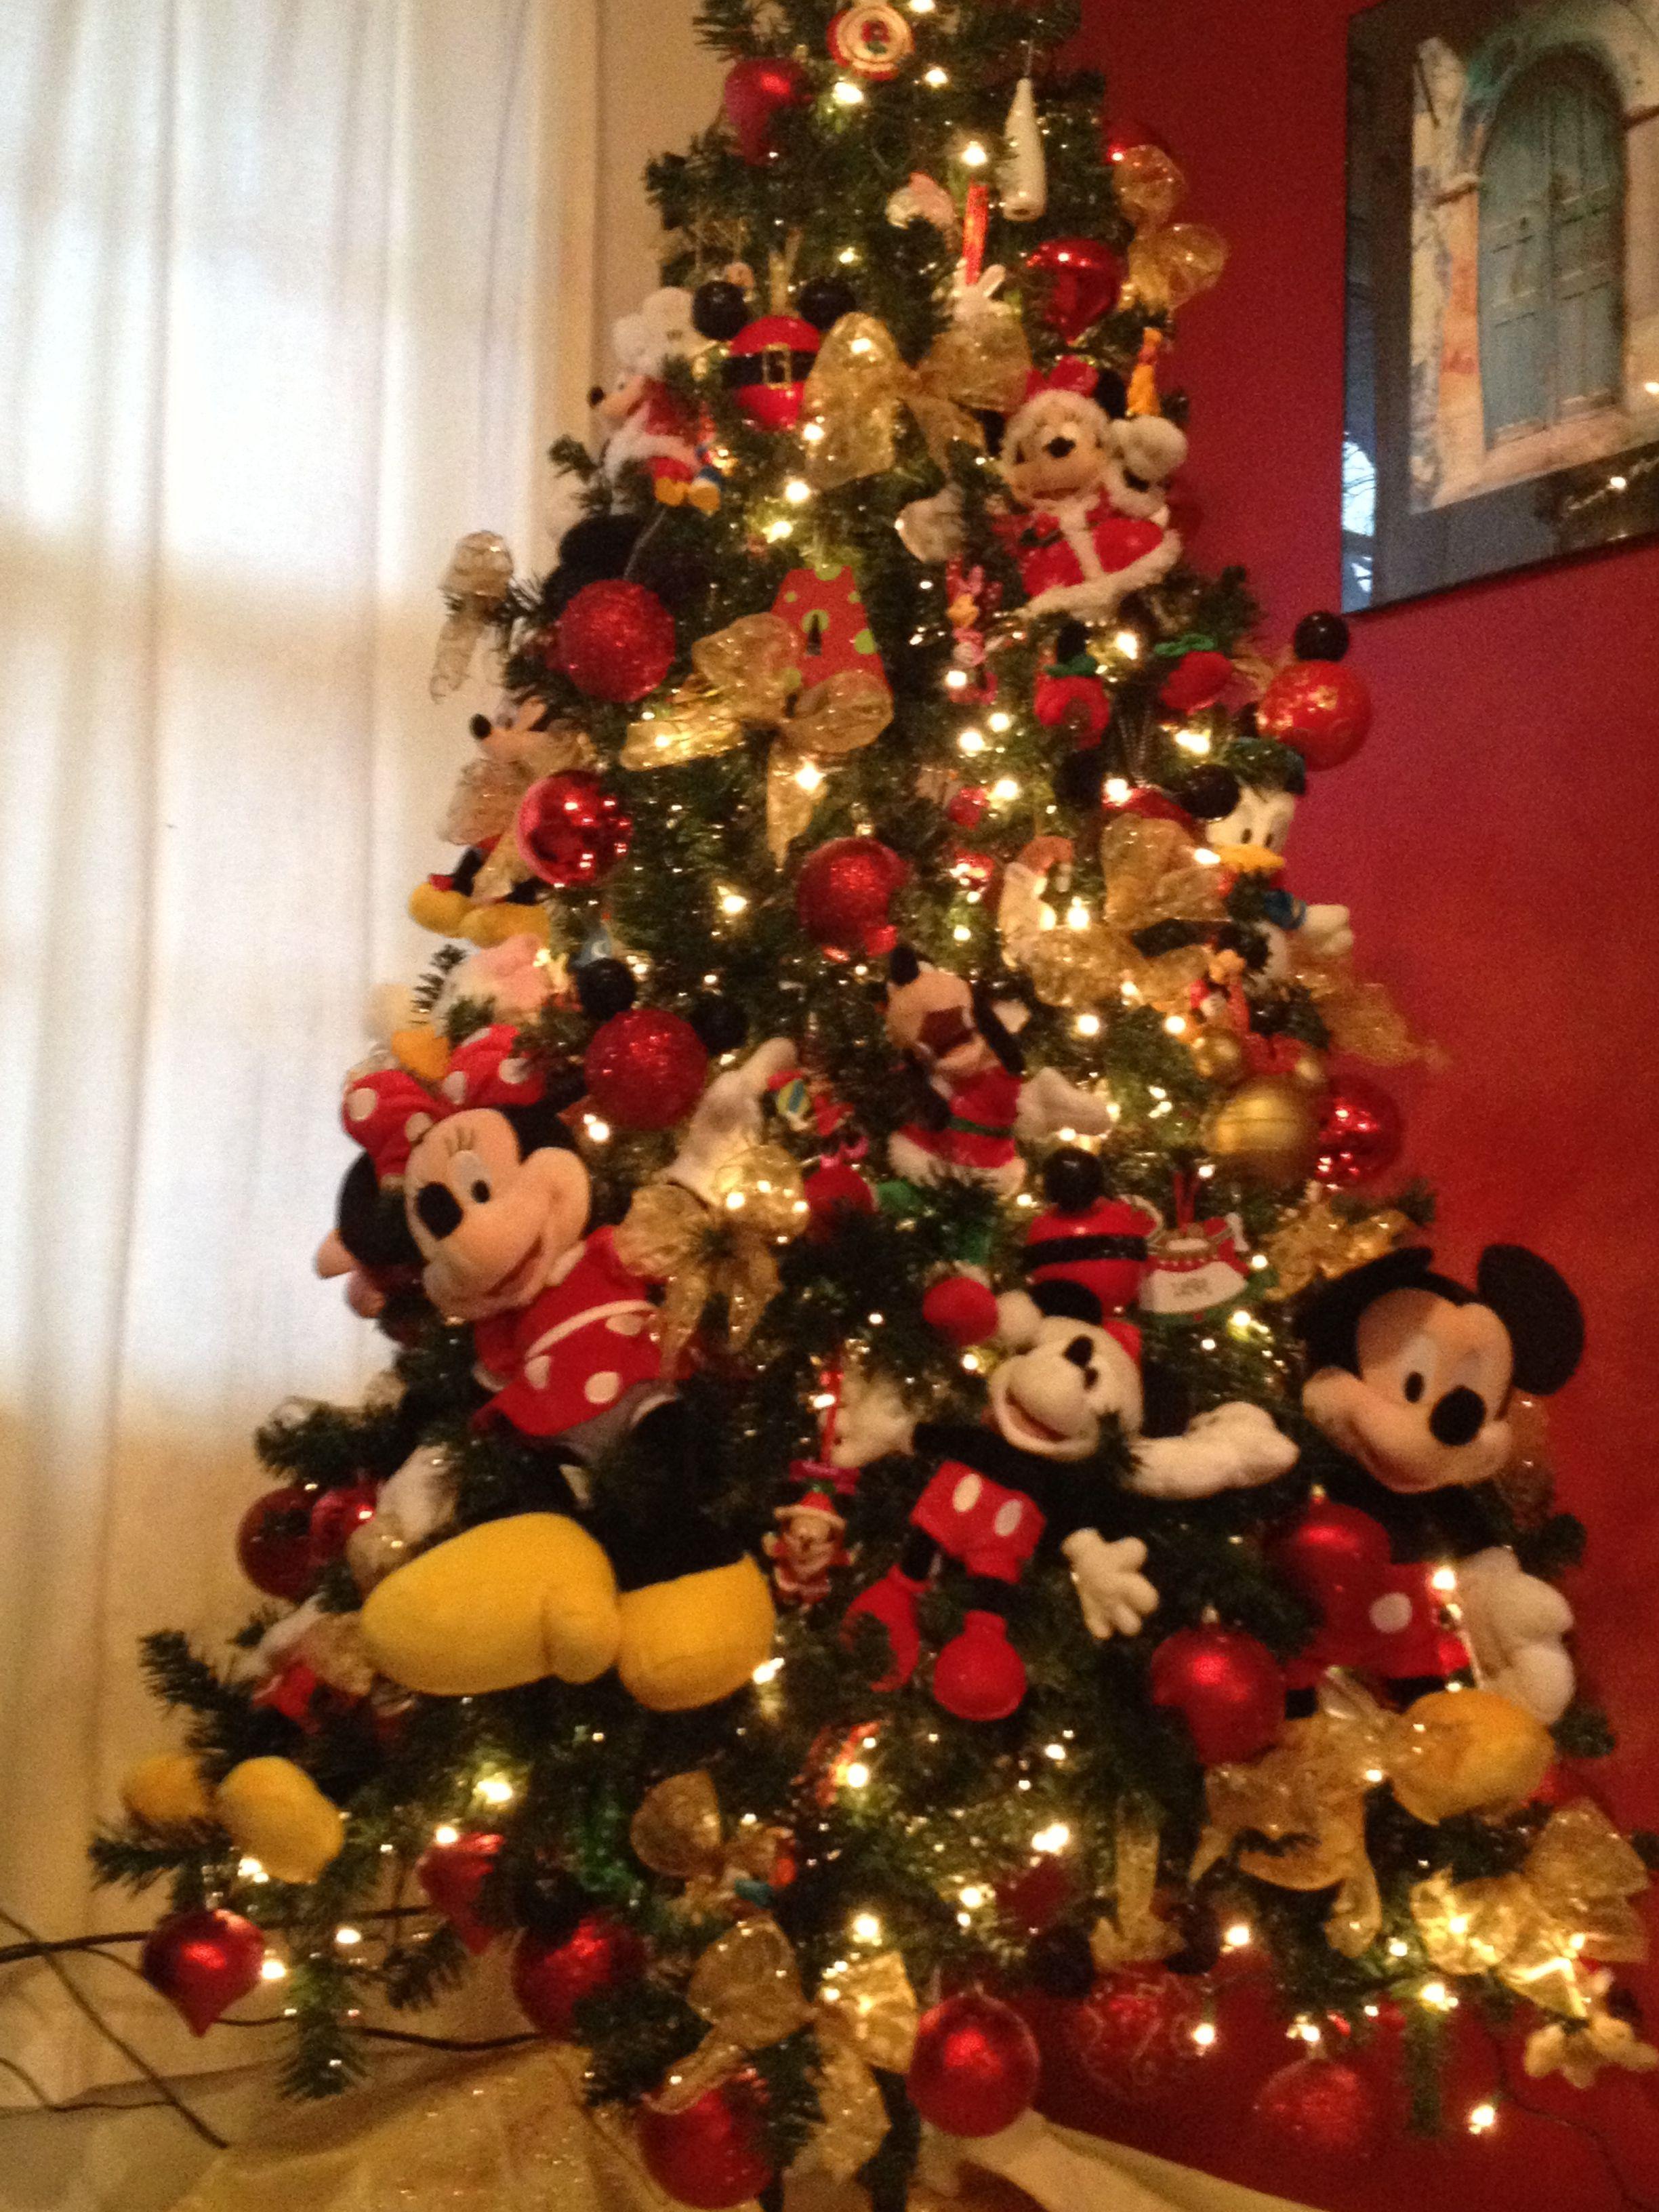 Mickey mouse and friends christmas tree everything - Arboles de navidad decorados ...